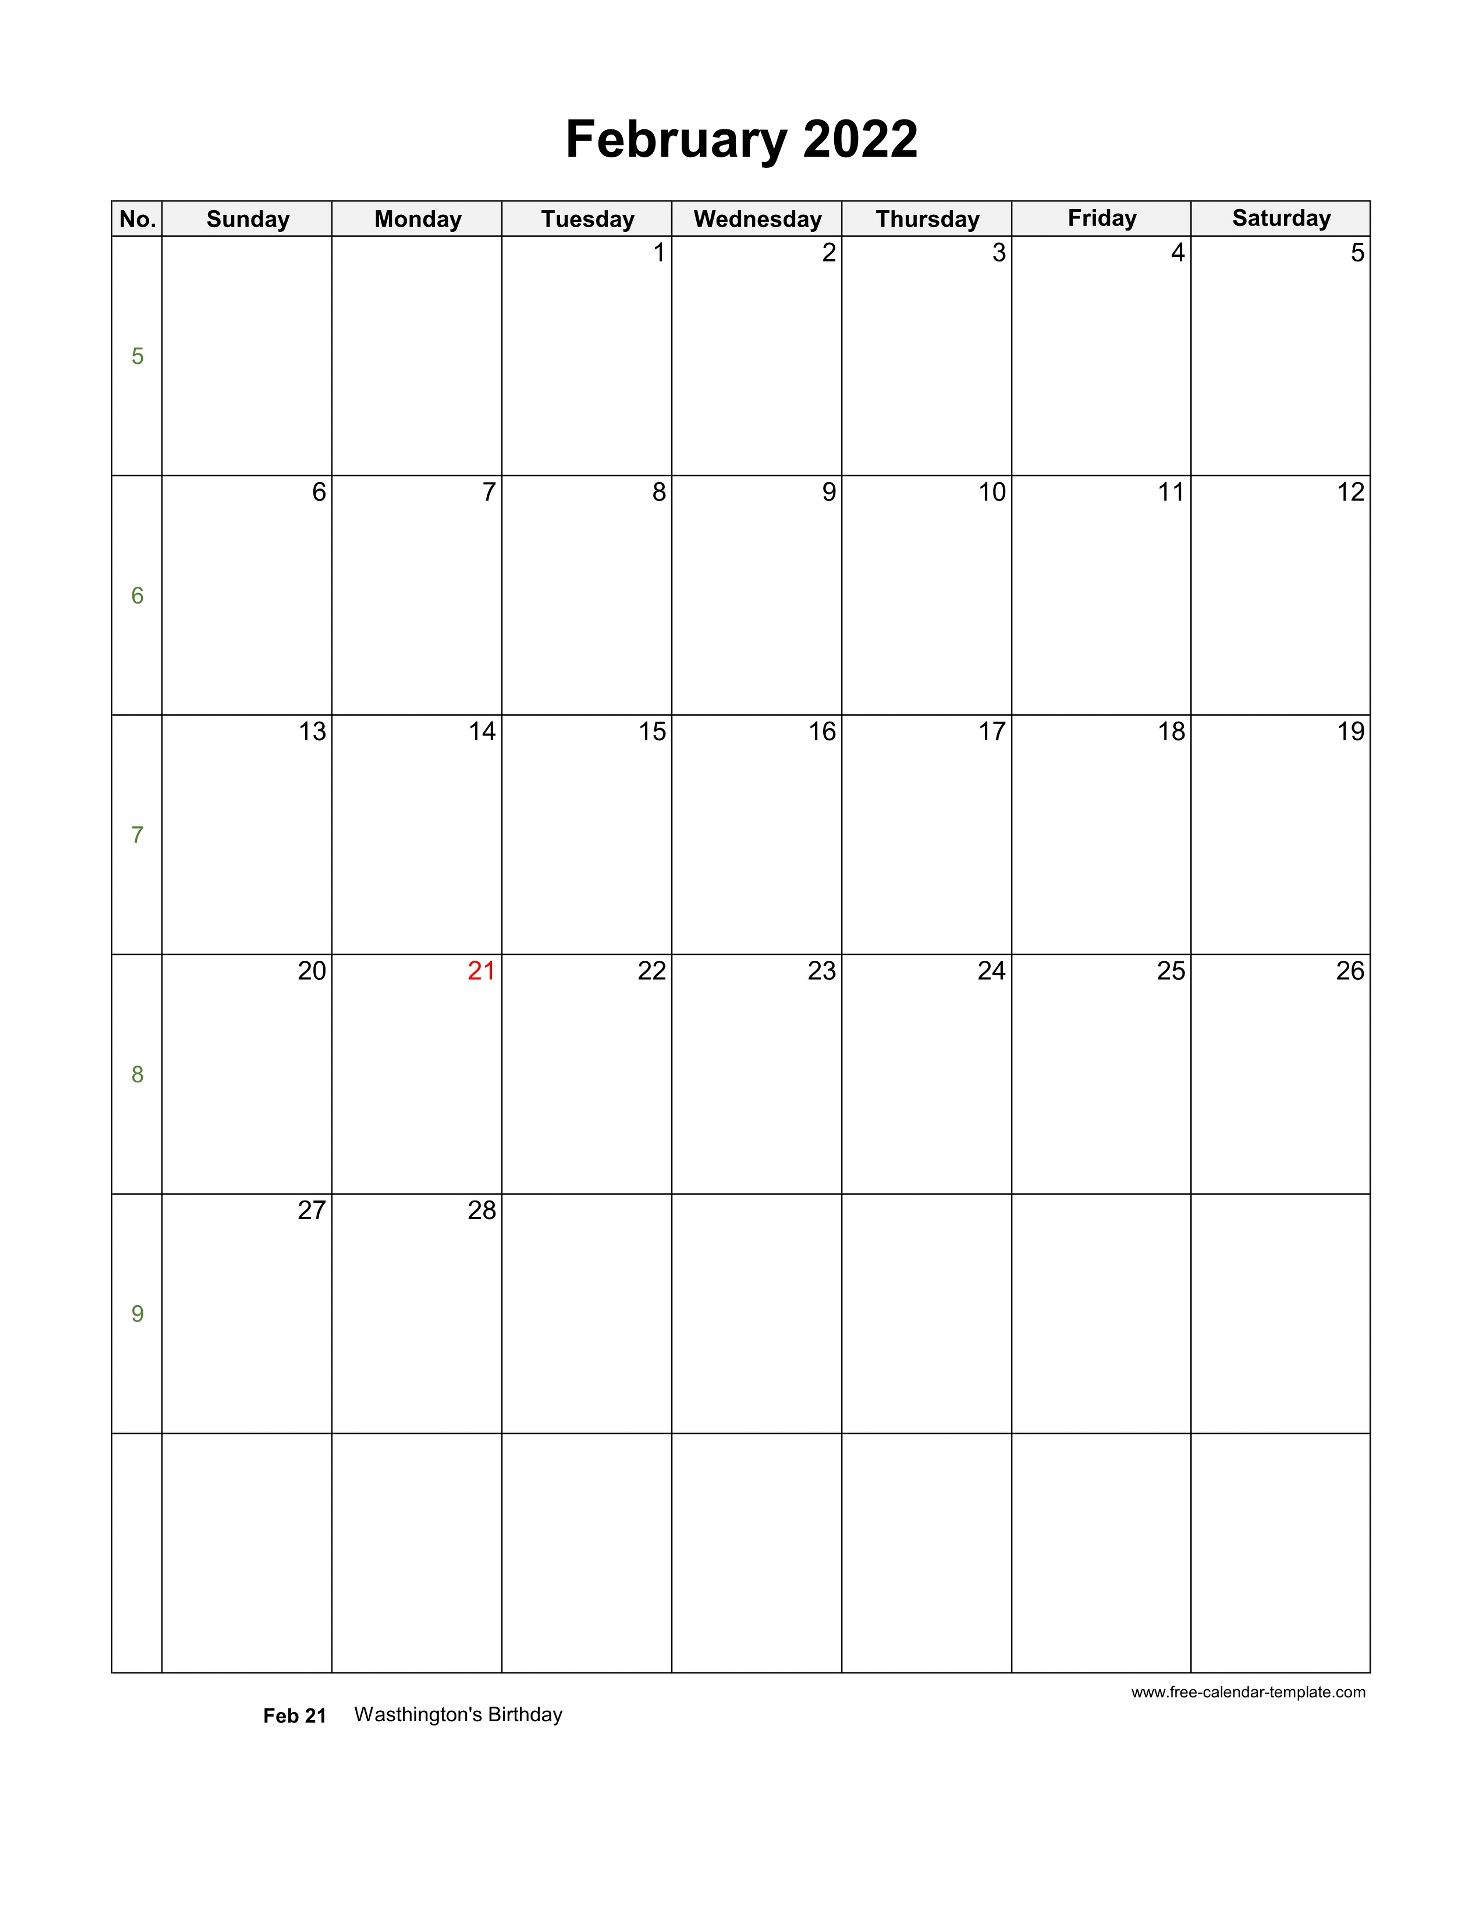 2022 February Calendar (Blank Vertical Template) | Free ...